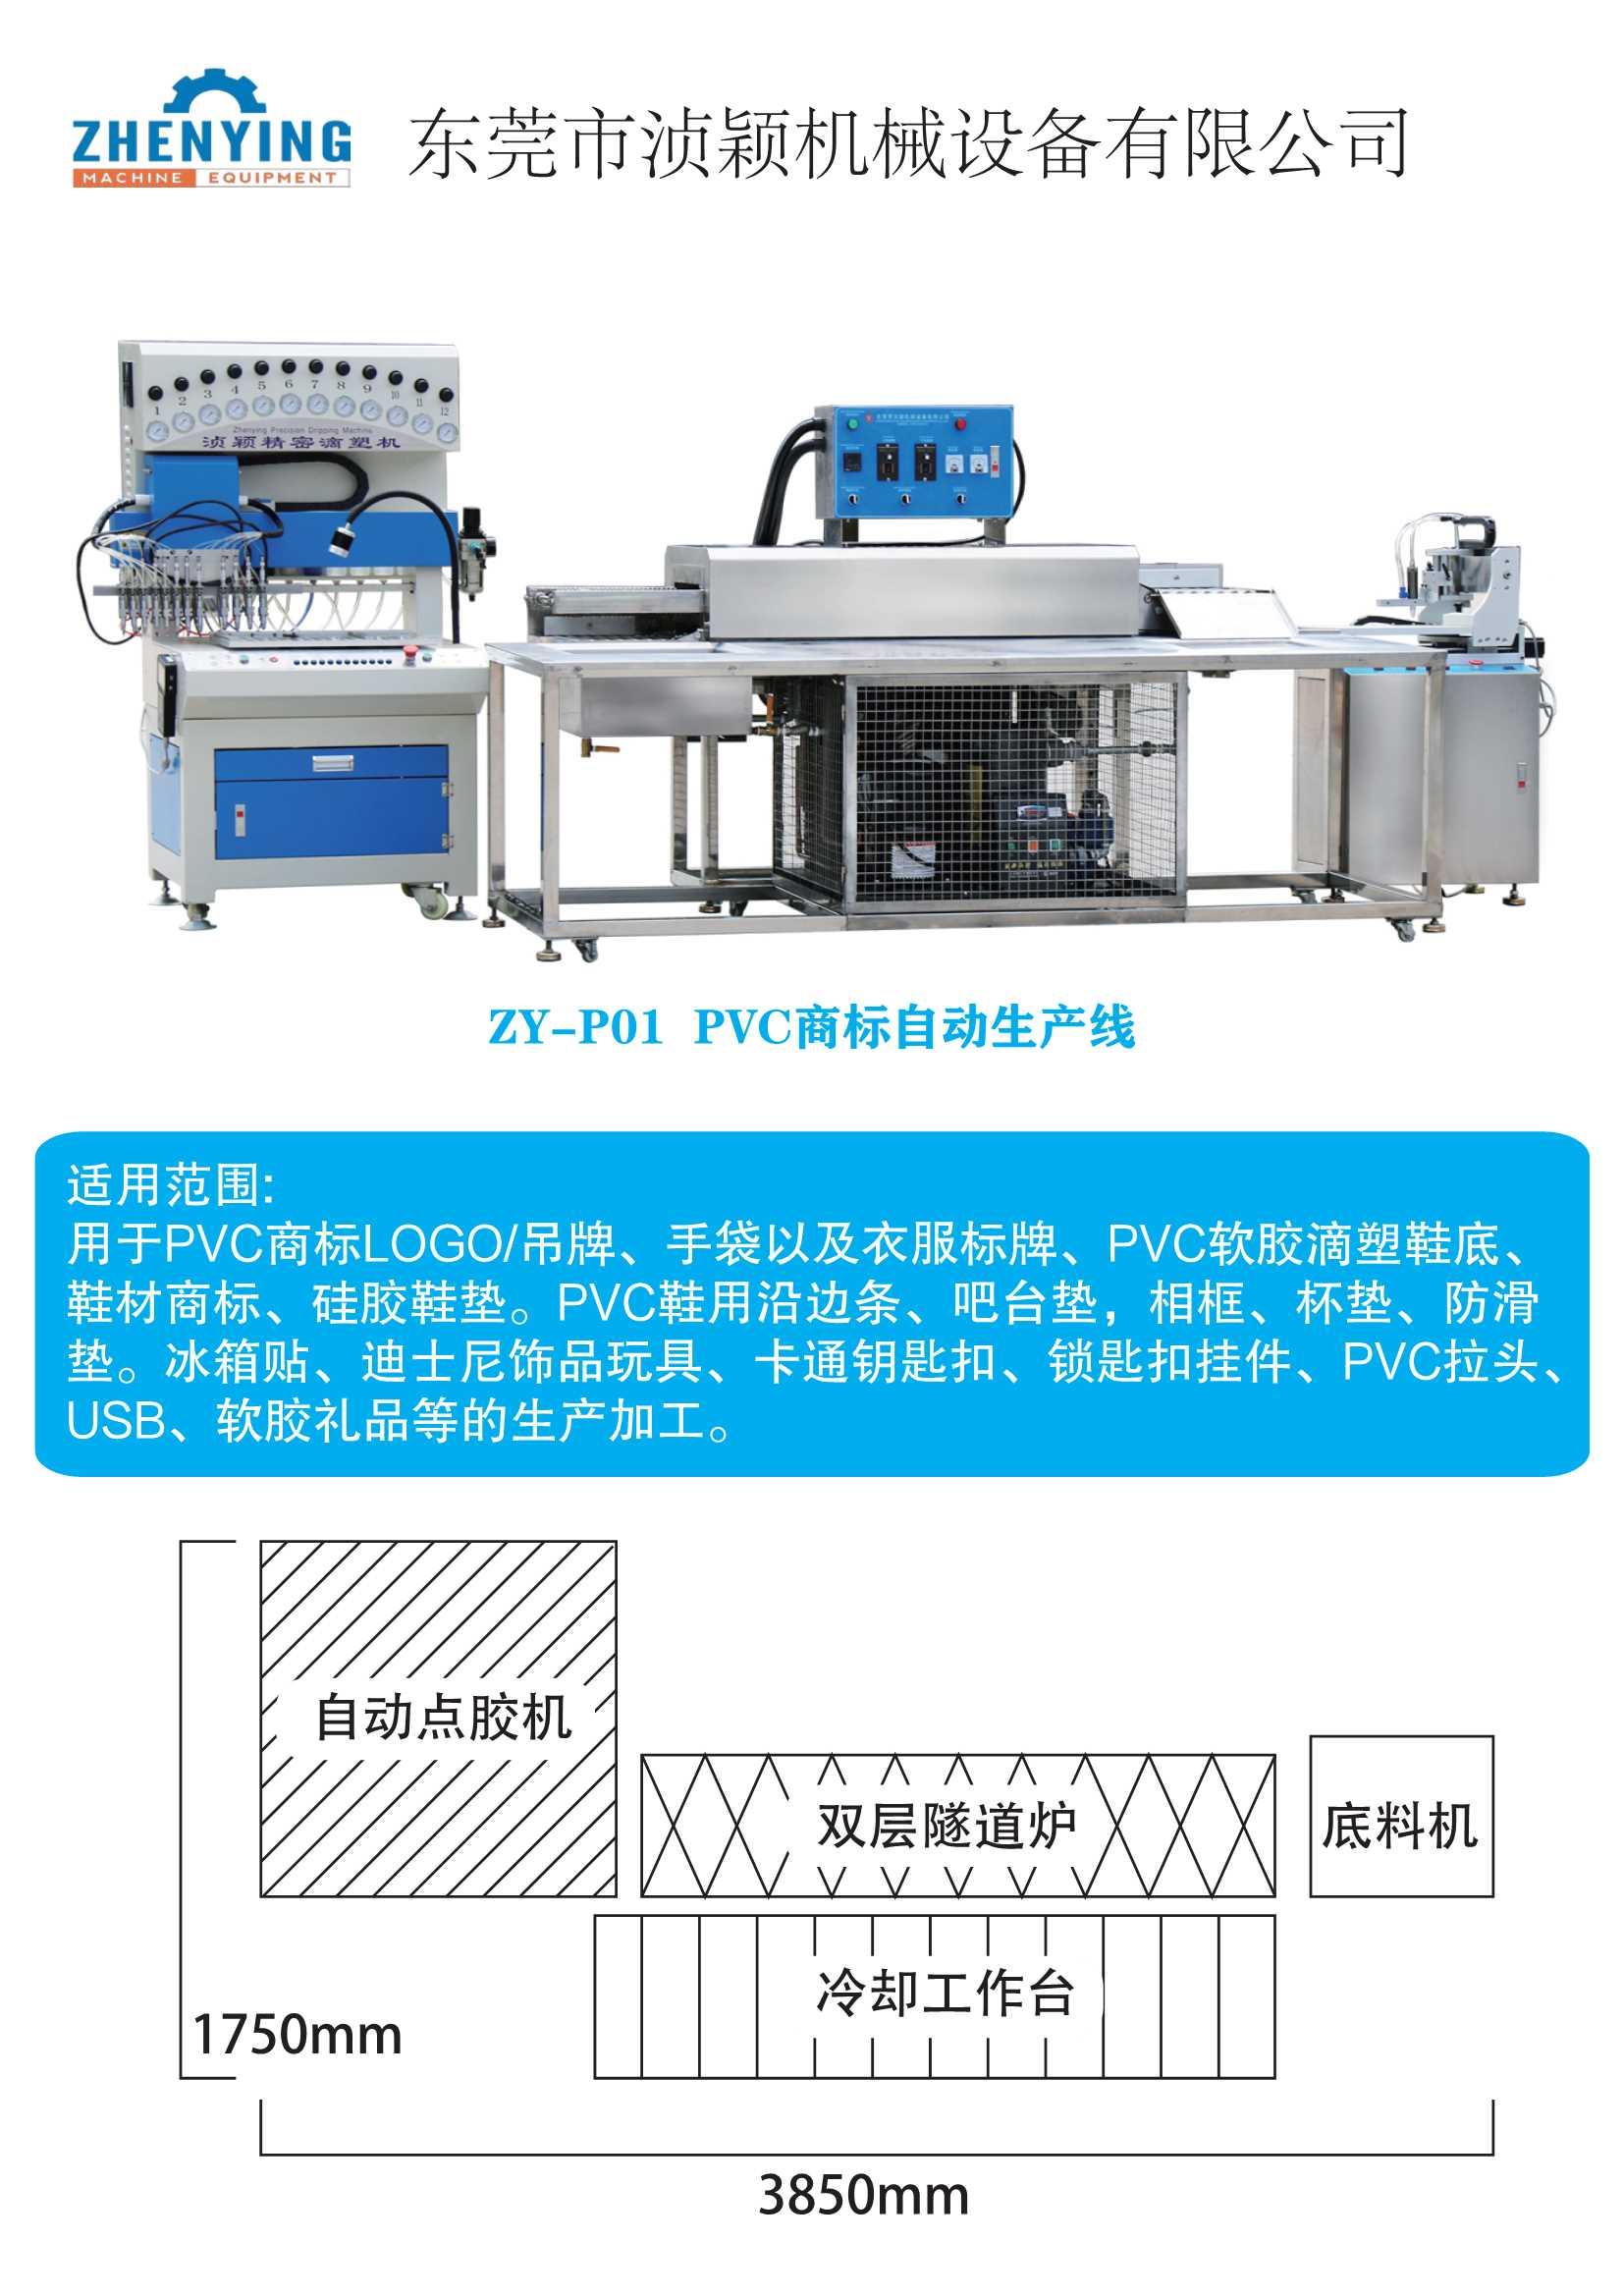 PVC商标自动生产线设备